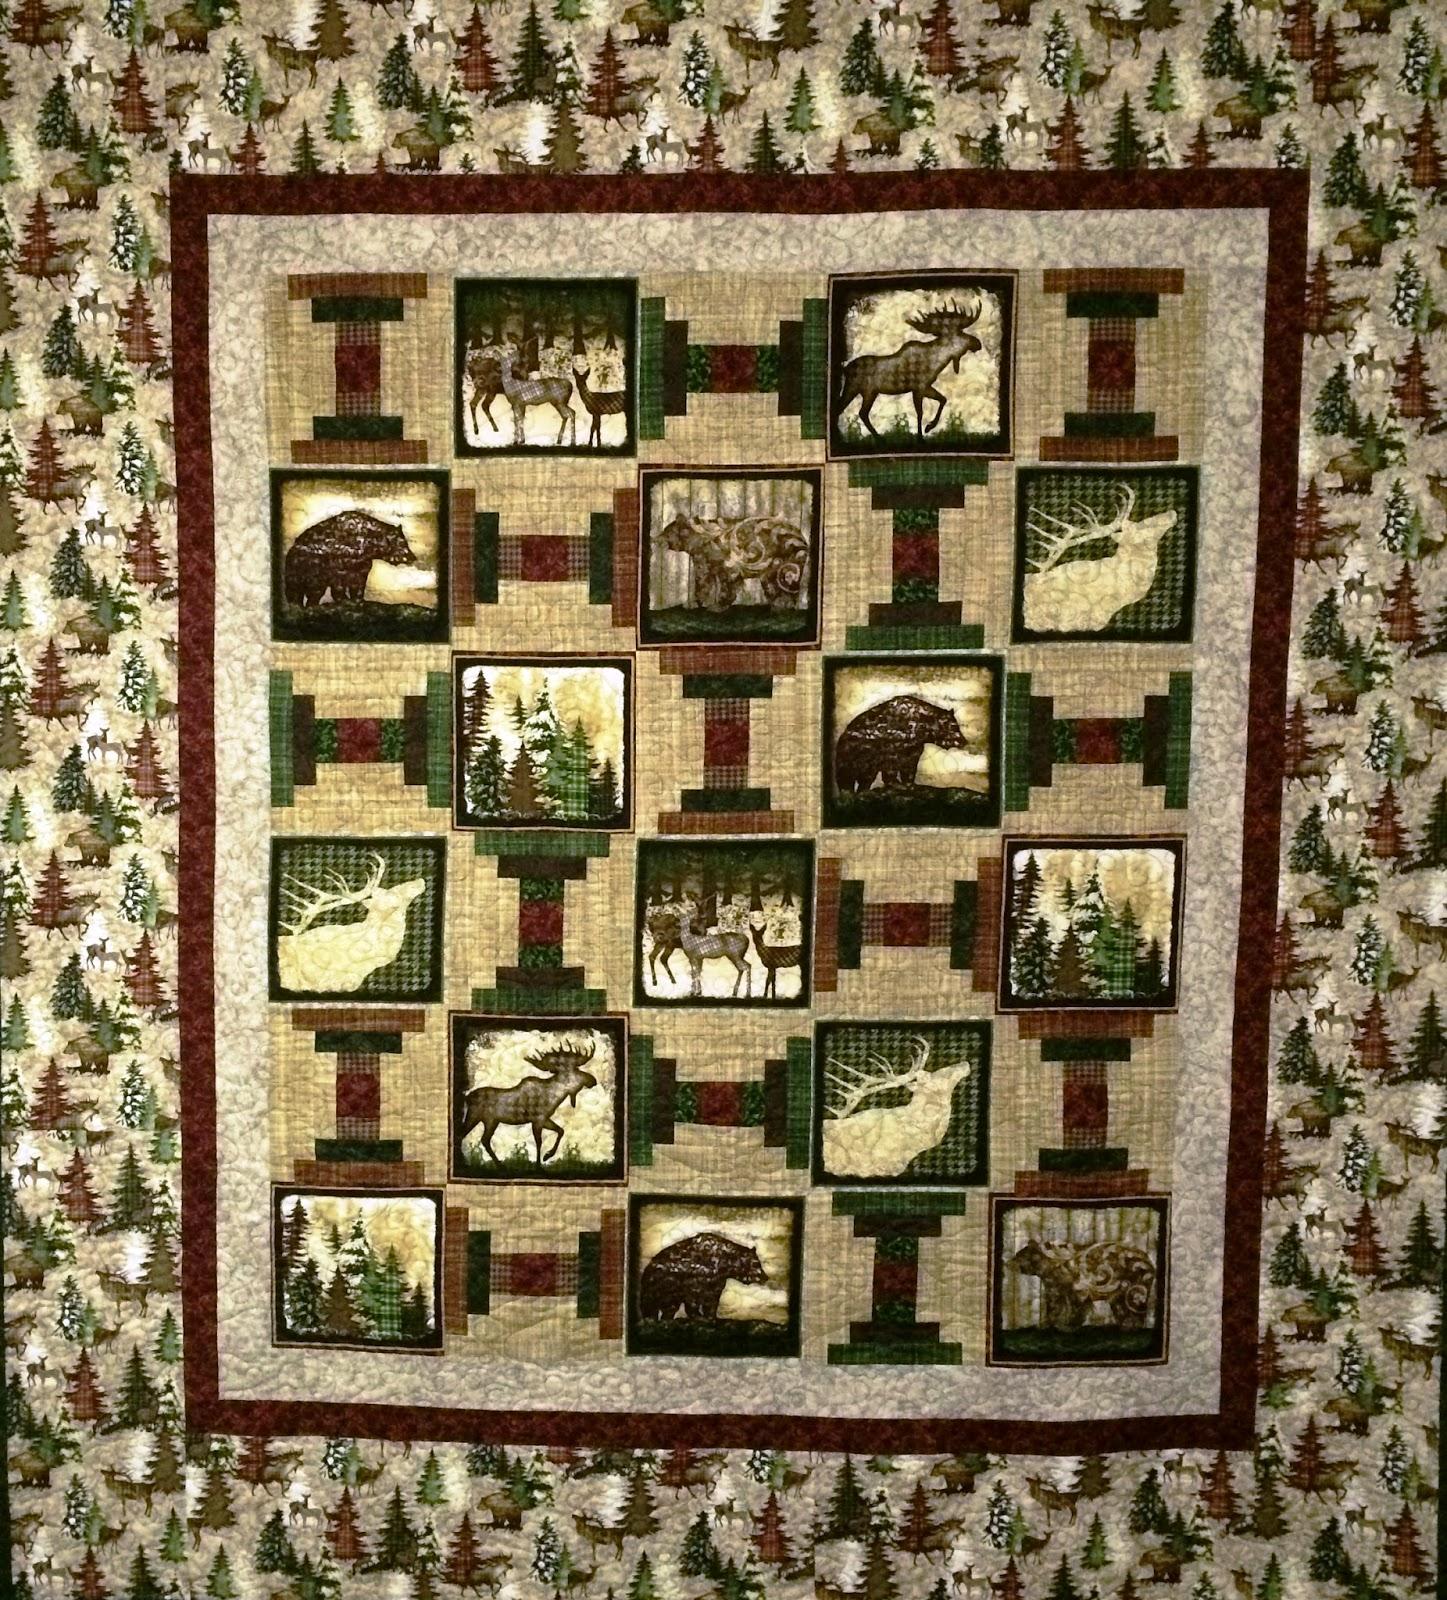 Terri Manley's Wildlife Quilt